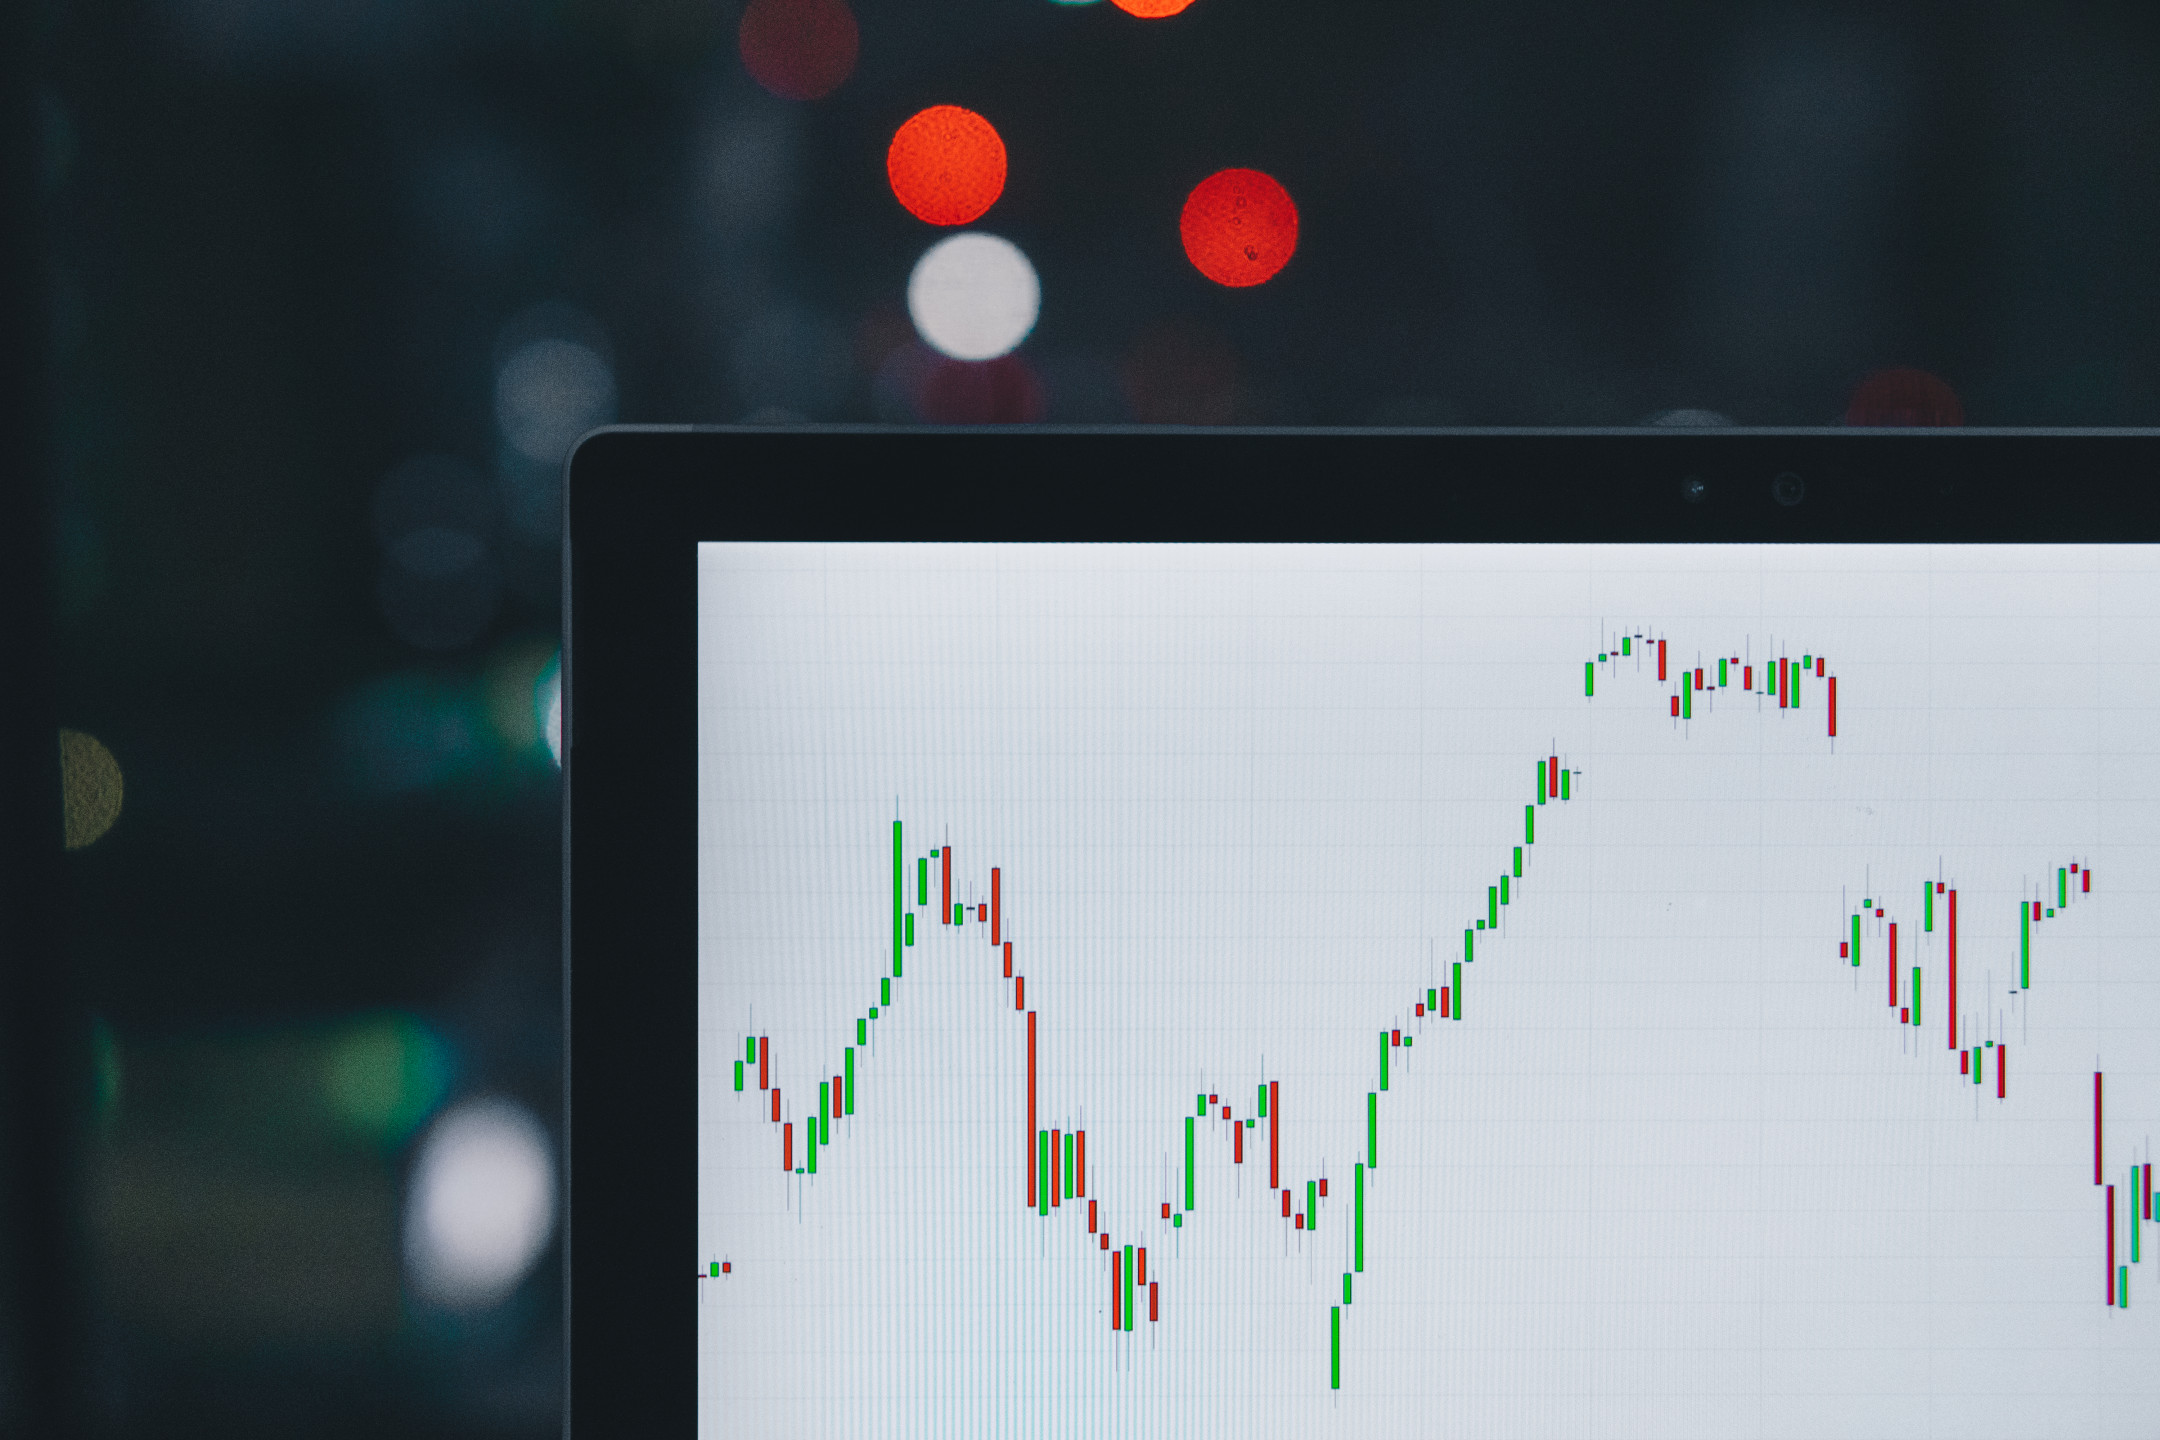 USDJPY price bearish below 110.90- What next?